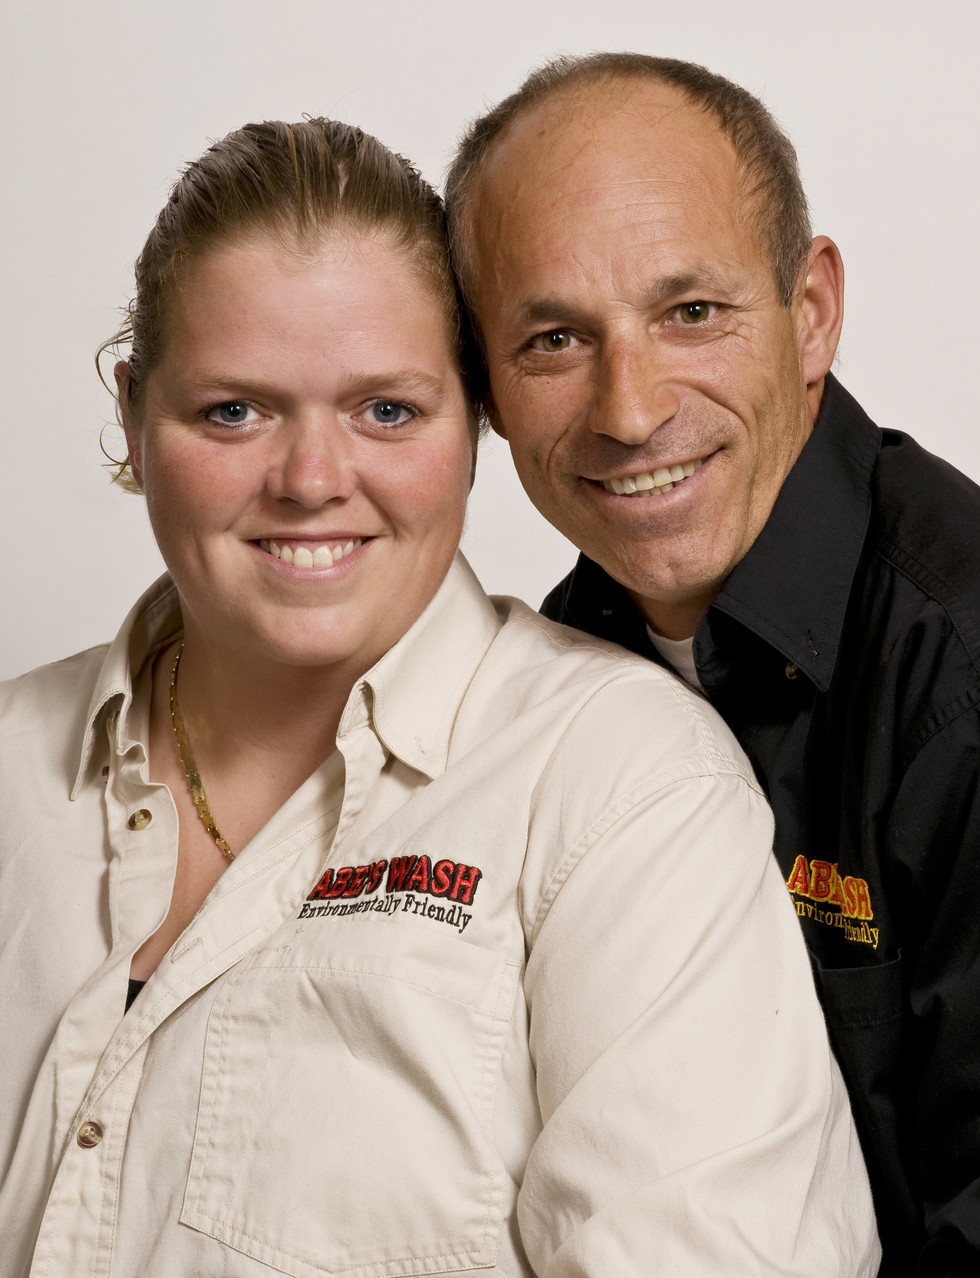 Husband & wife business portrait